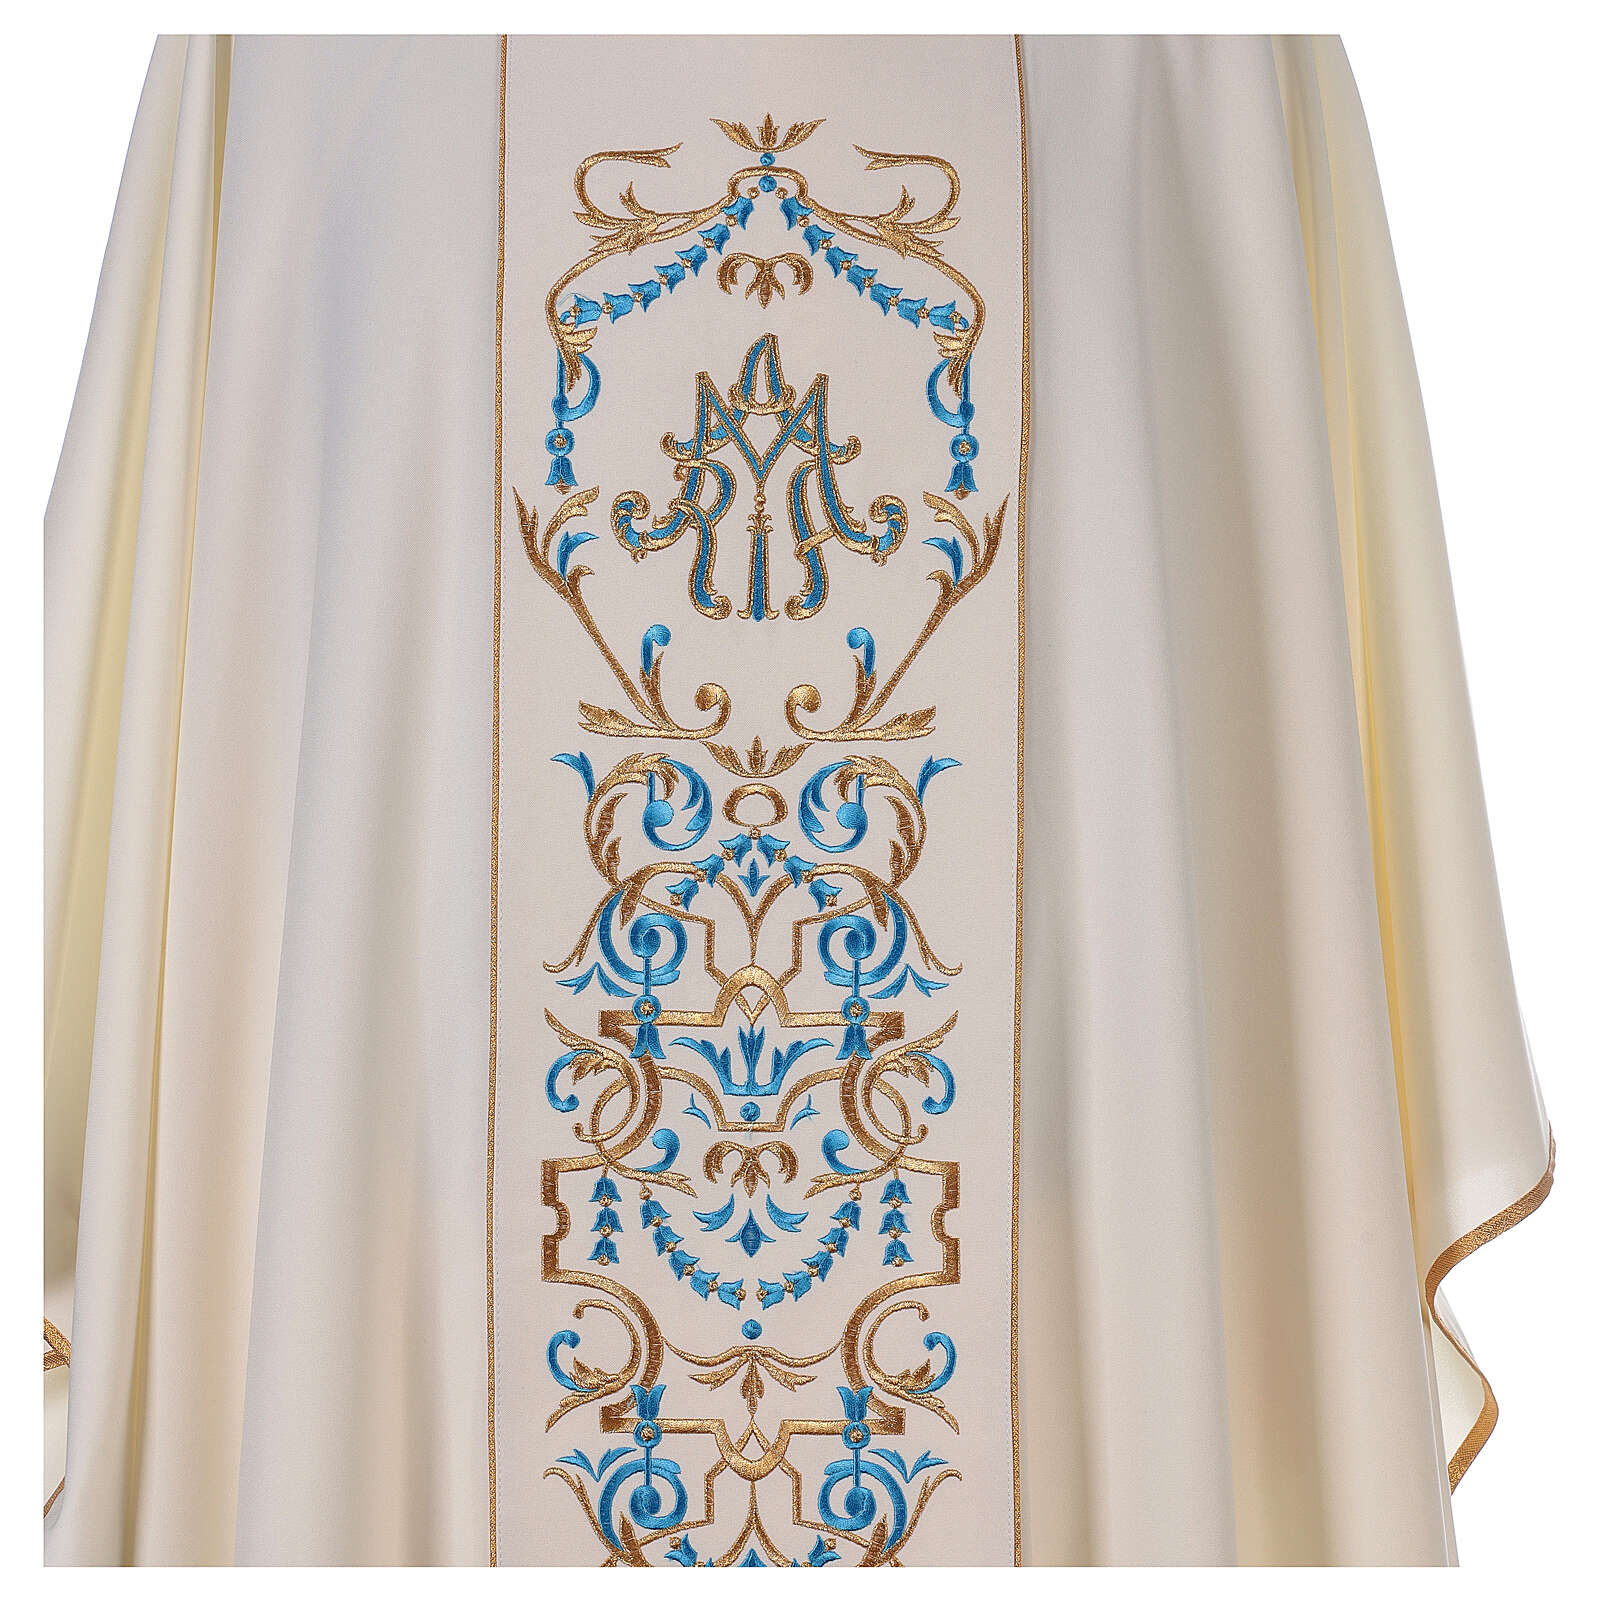 Casula mariana e estola bordado MA 4